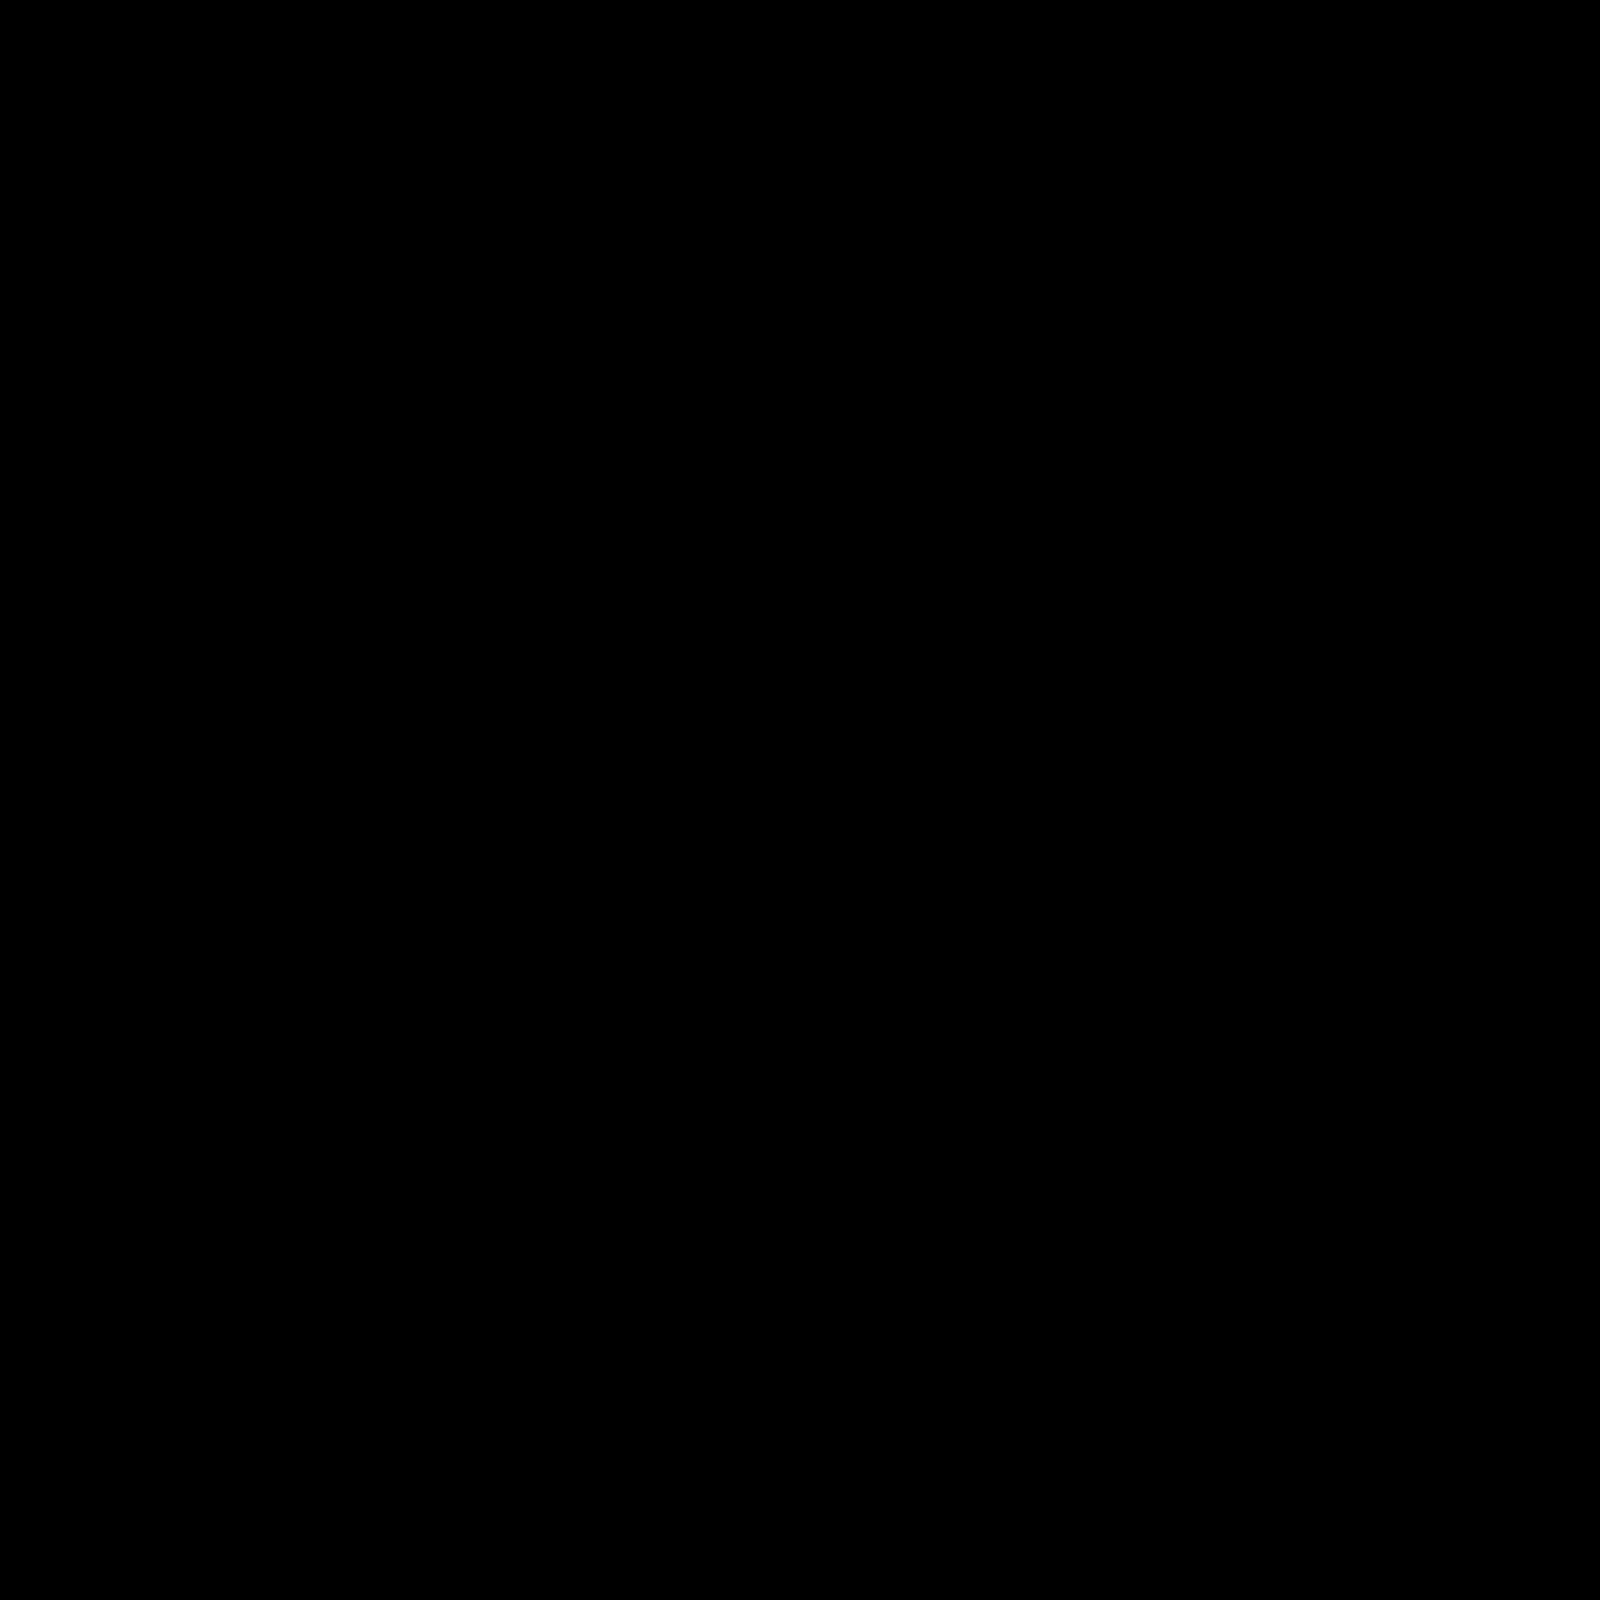 Sidebar Menu icon